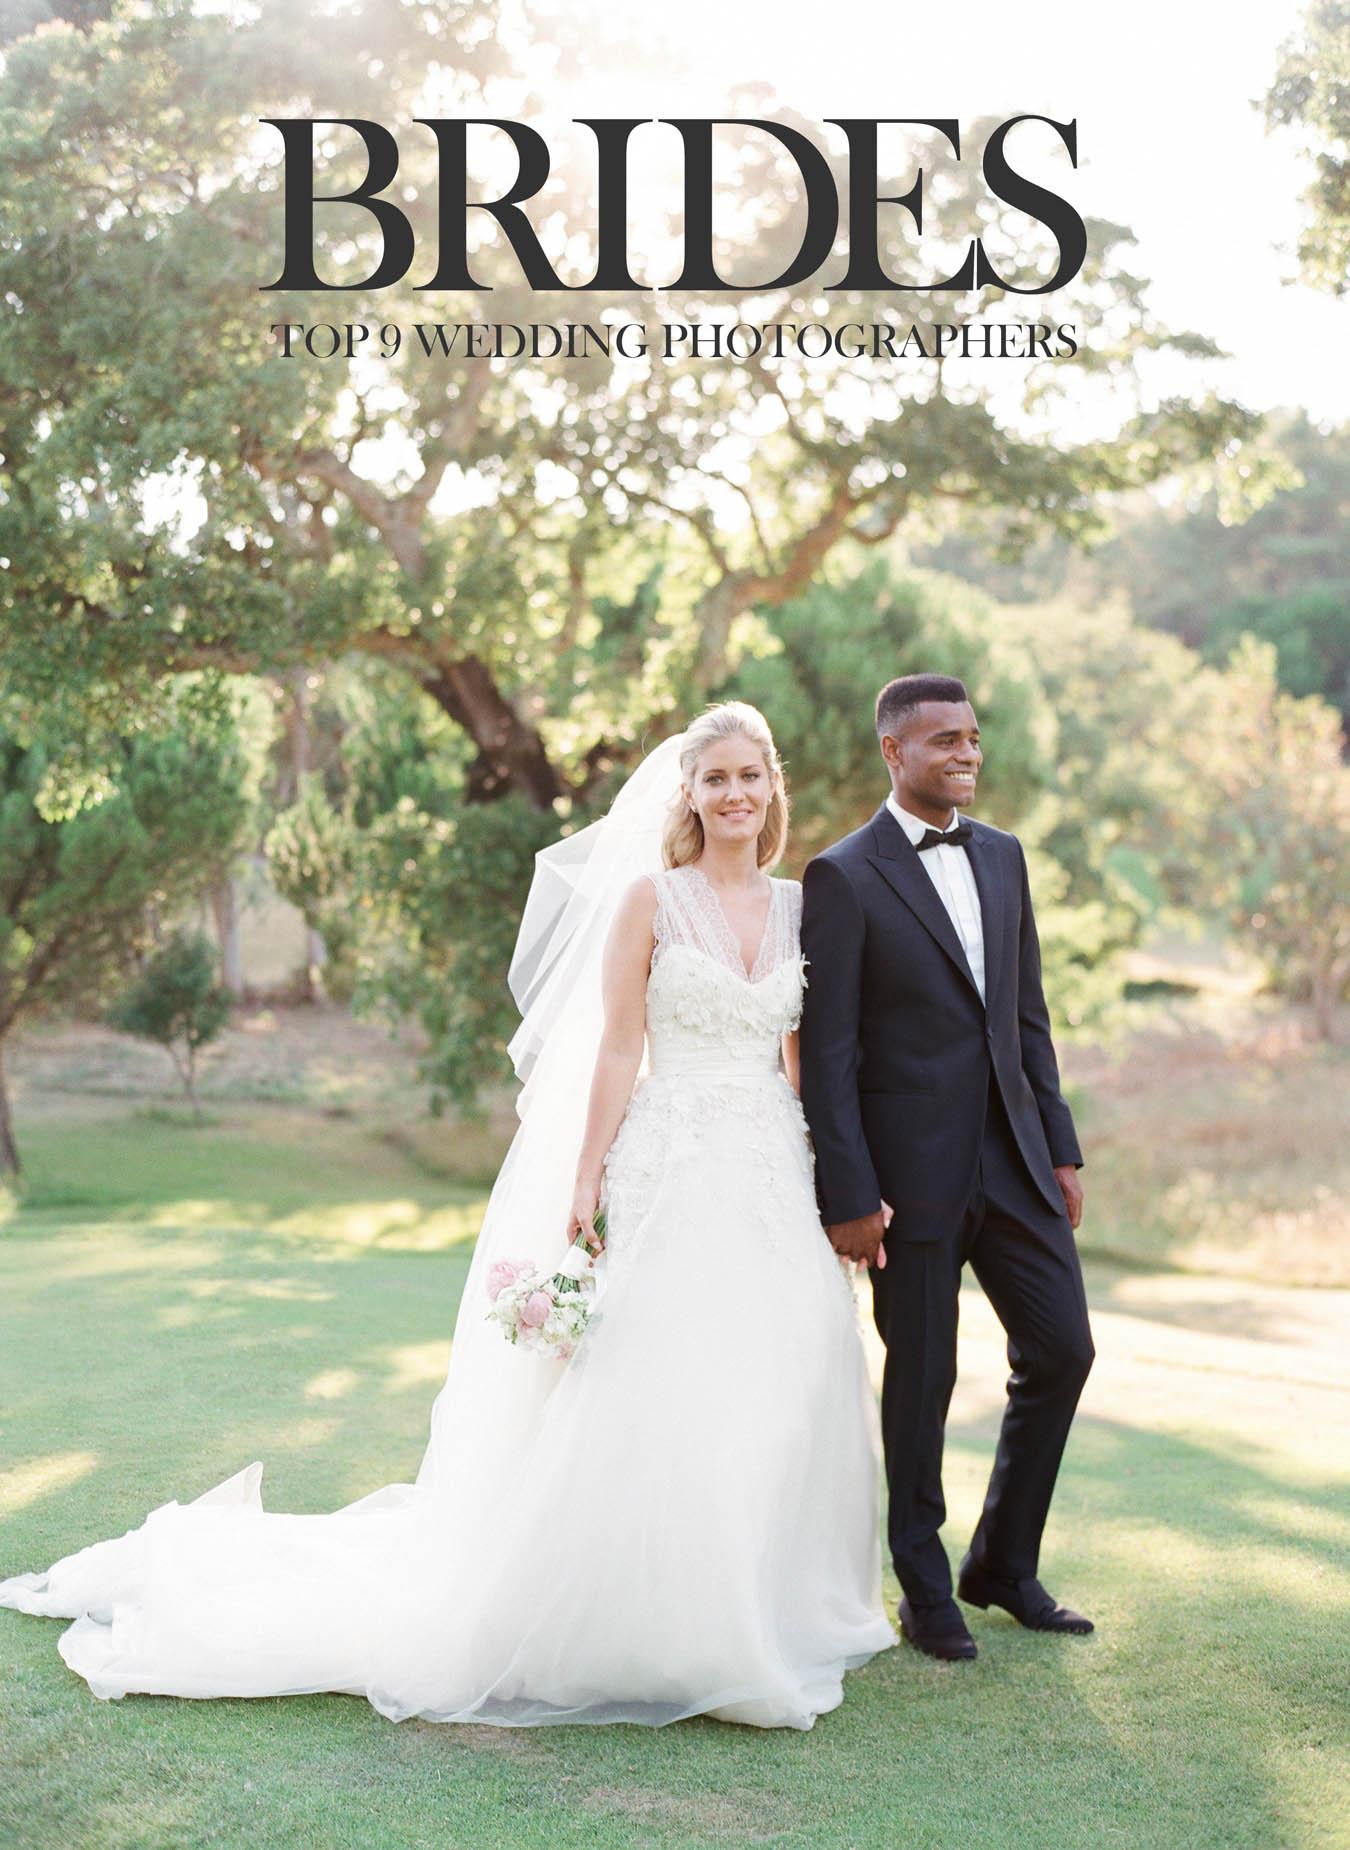 Brides-Magazine-Top-Photographer-Destination-Wedding